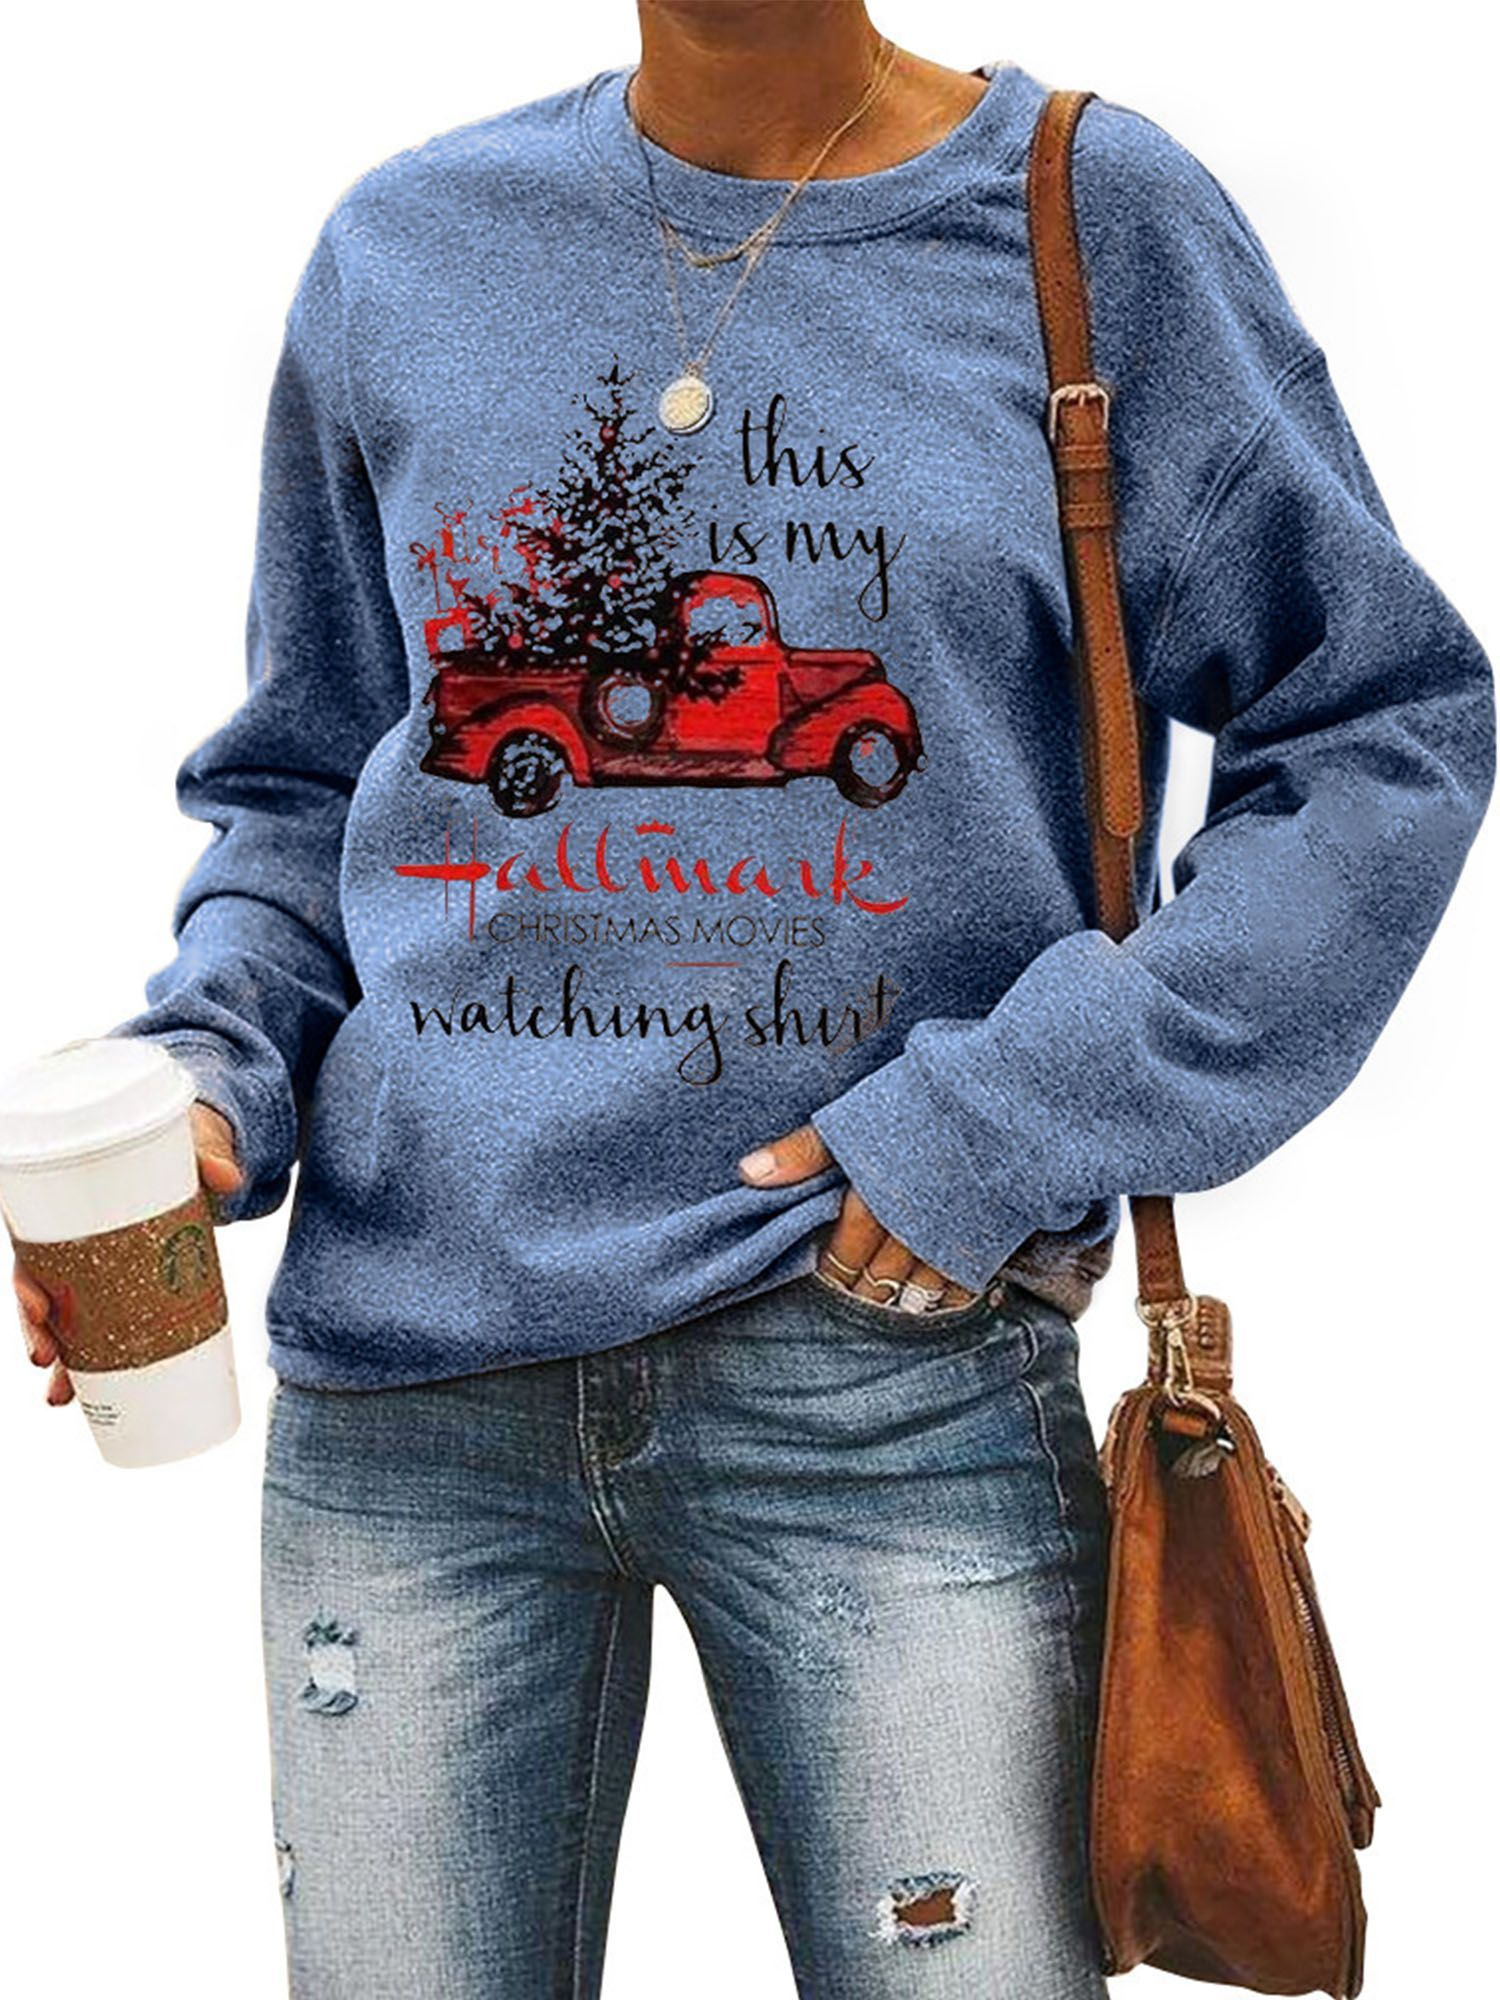 Amavo Avamo Christmas Tree Crew Neck Sweatshirt Pullover For Women Ladies Xmas Holiday Sweater T Shirt Top Winter Fall Spring Walmart Com Pullover Sweatshirts Cute Christmas Sweater Sweatshirts [ 2000 x 1500 Pixel ]